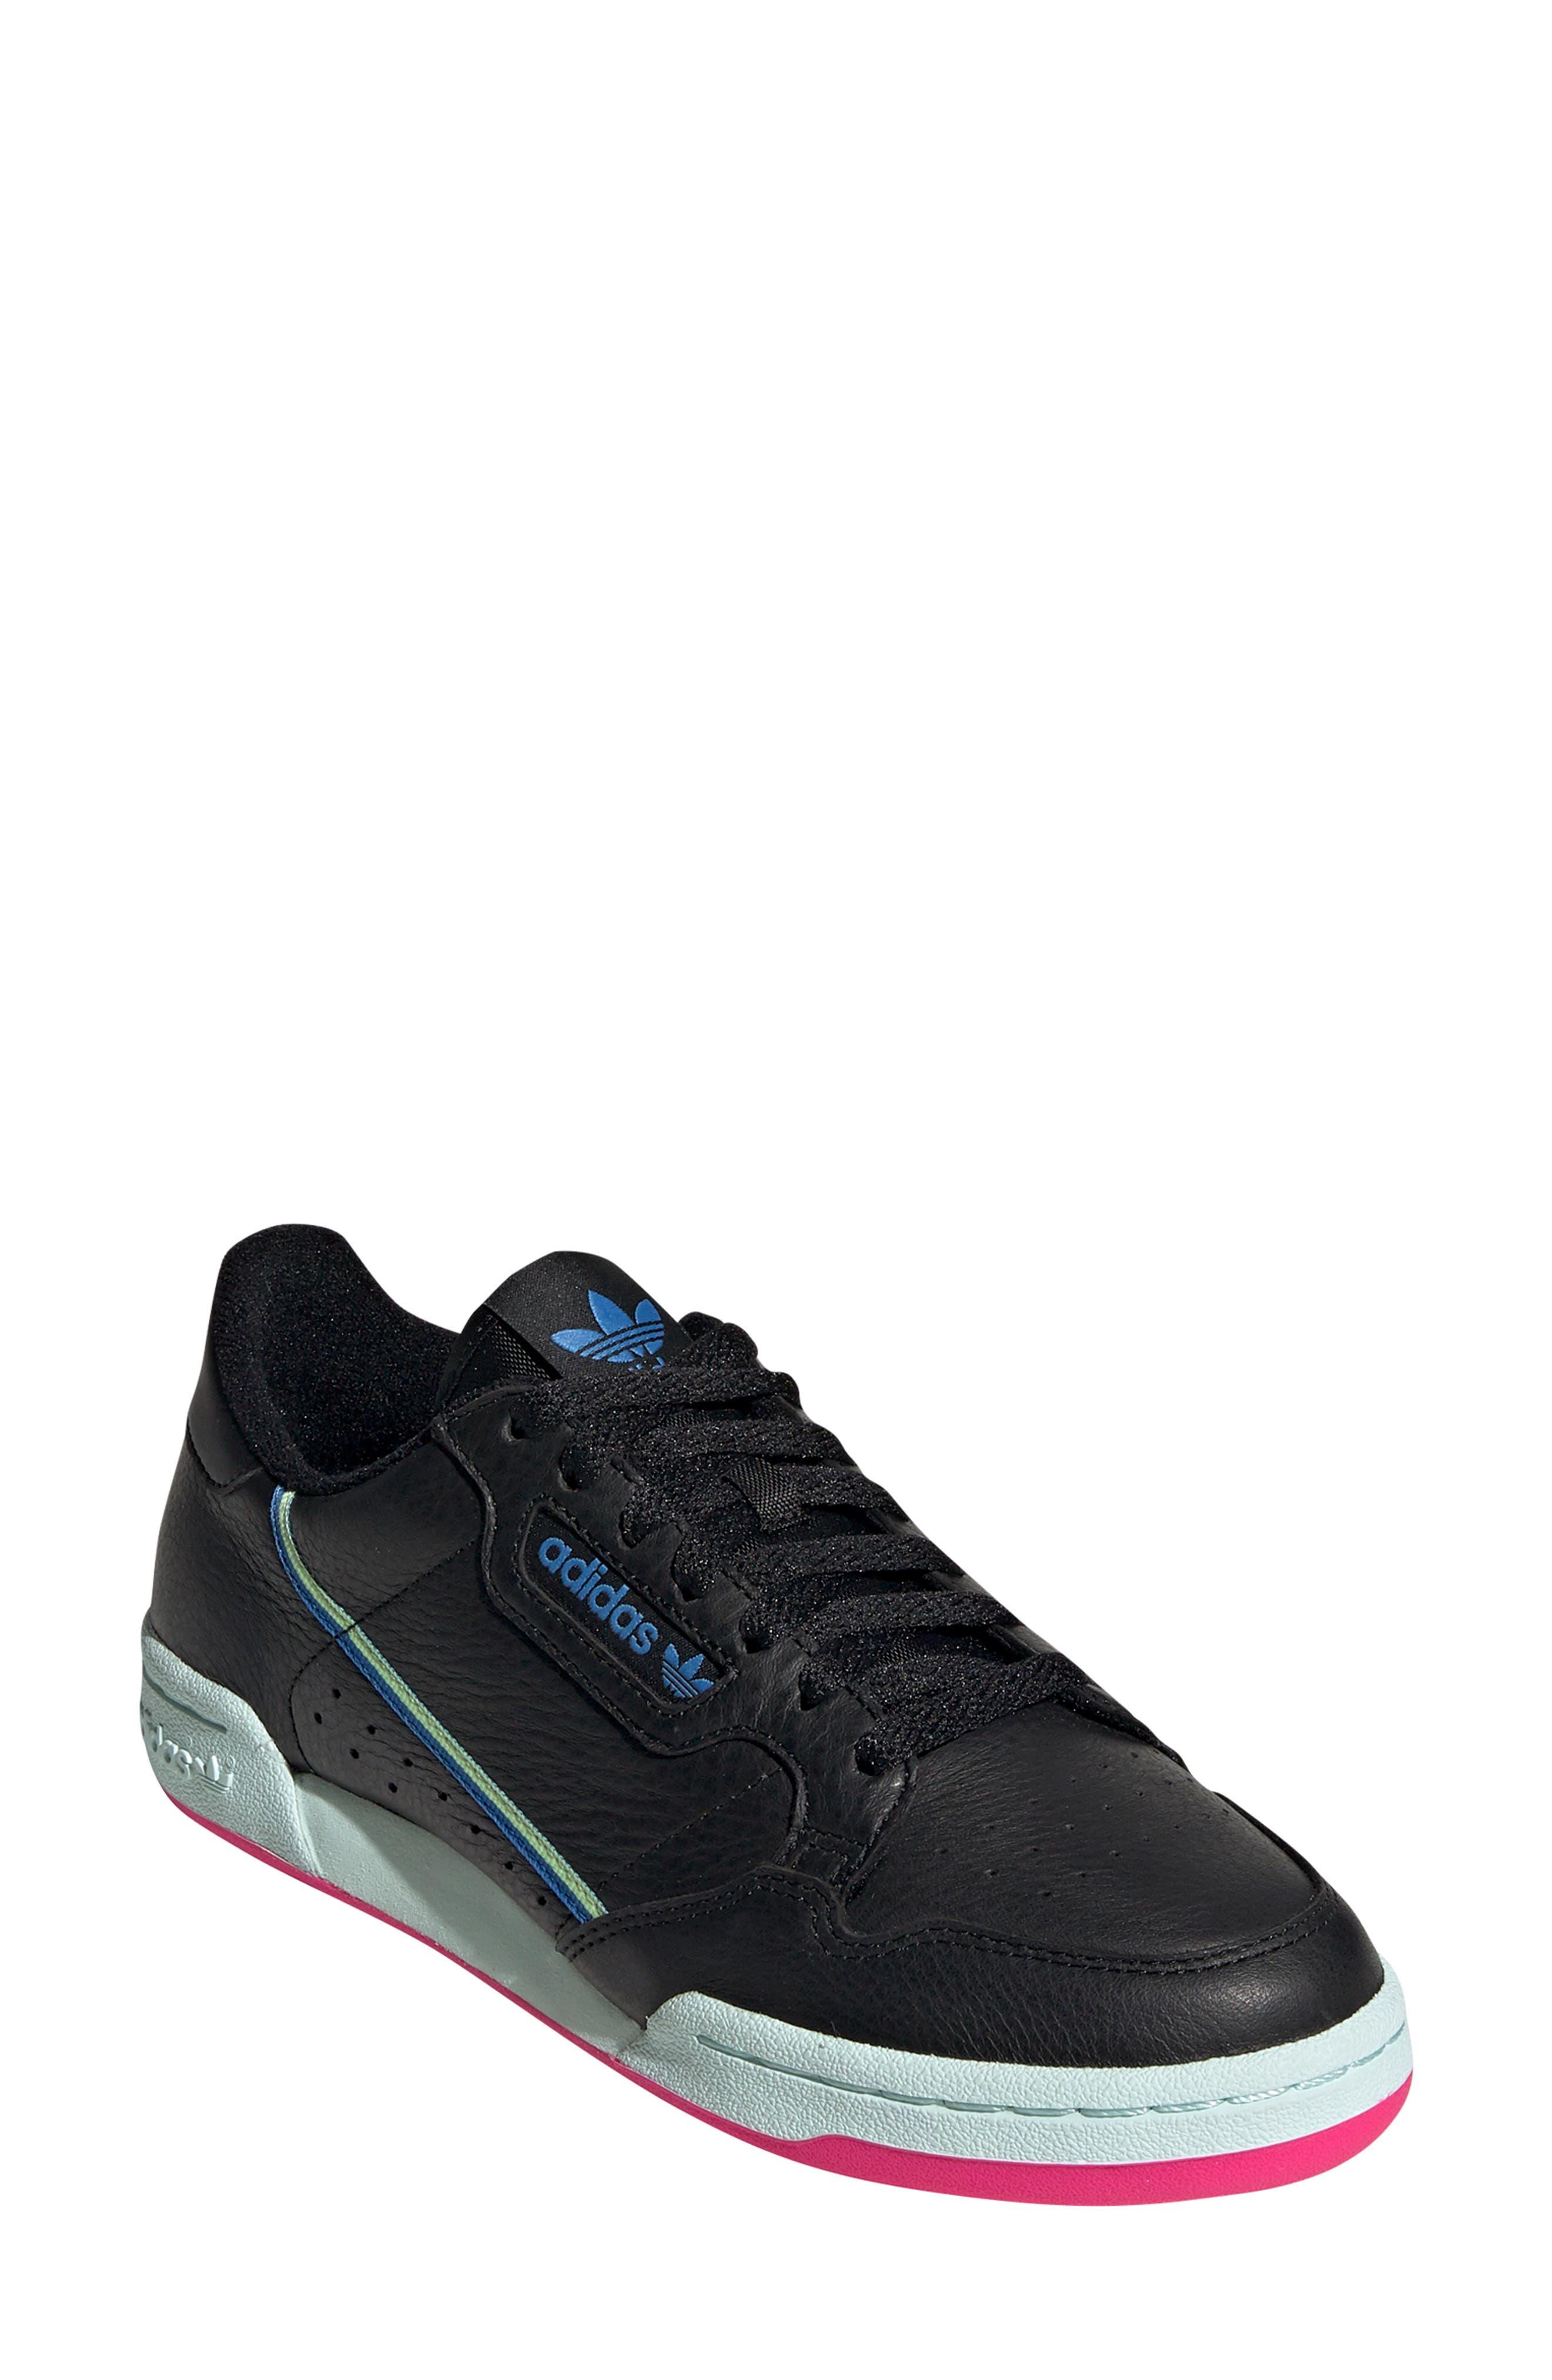 Adidas Continental 80 Sneaker / 4.5 Men